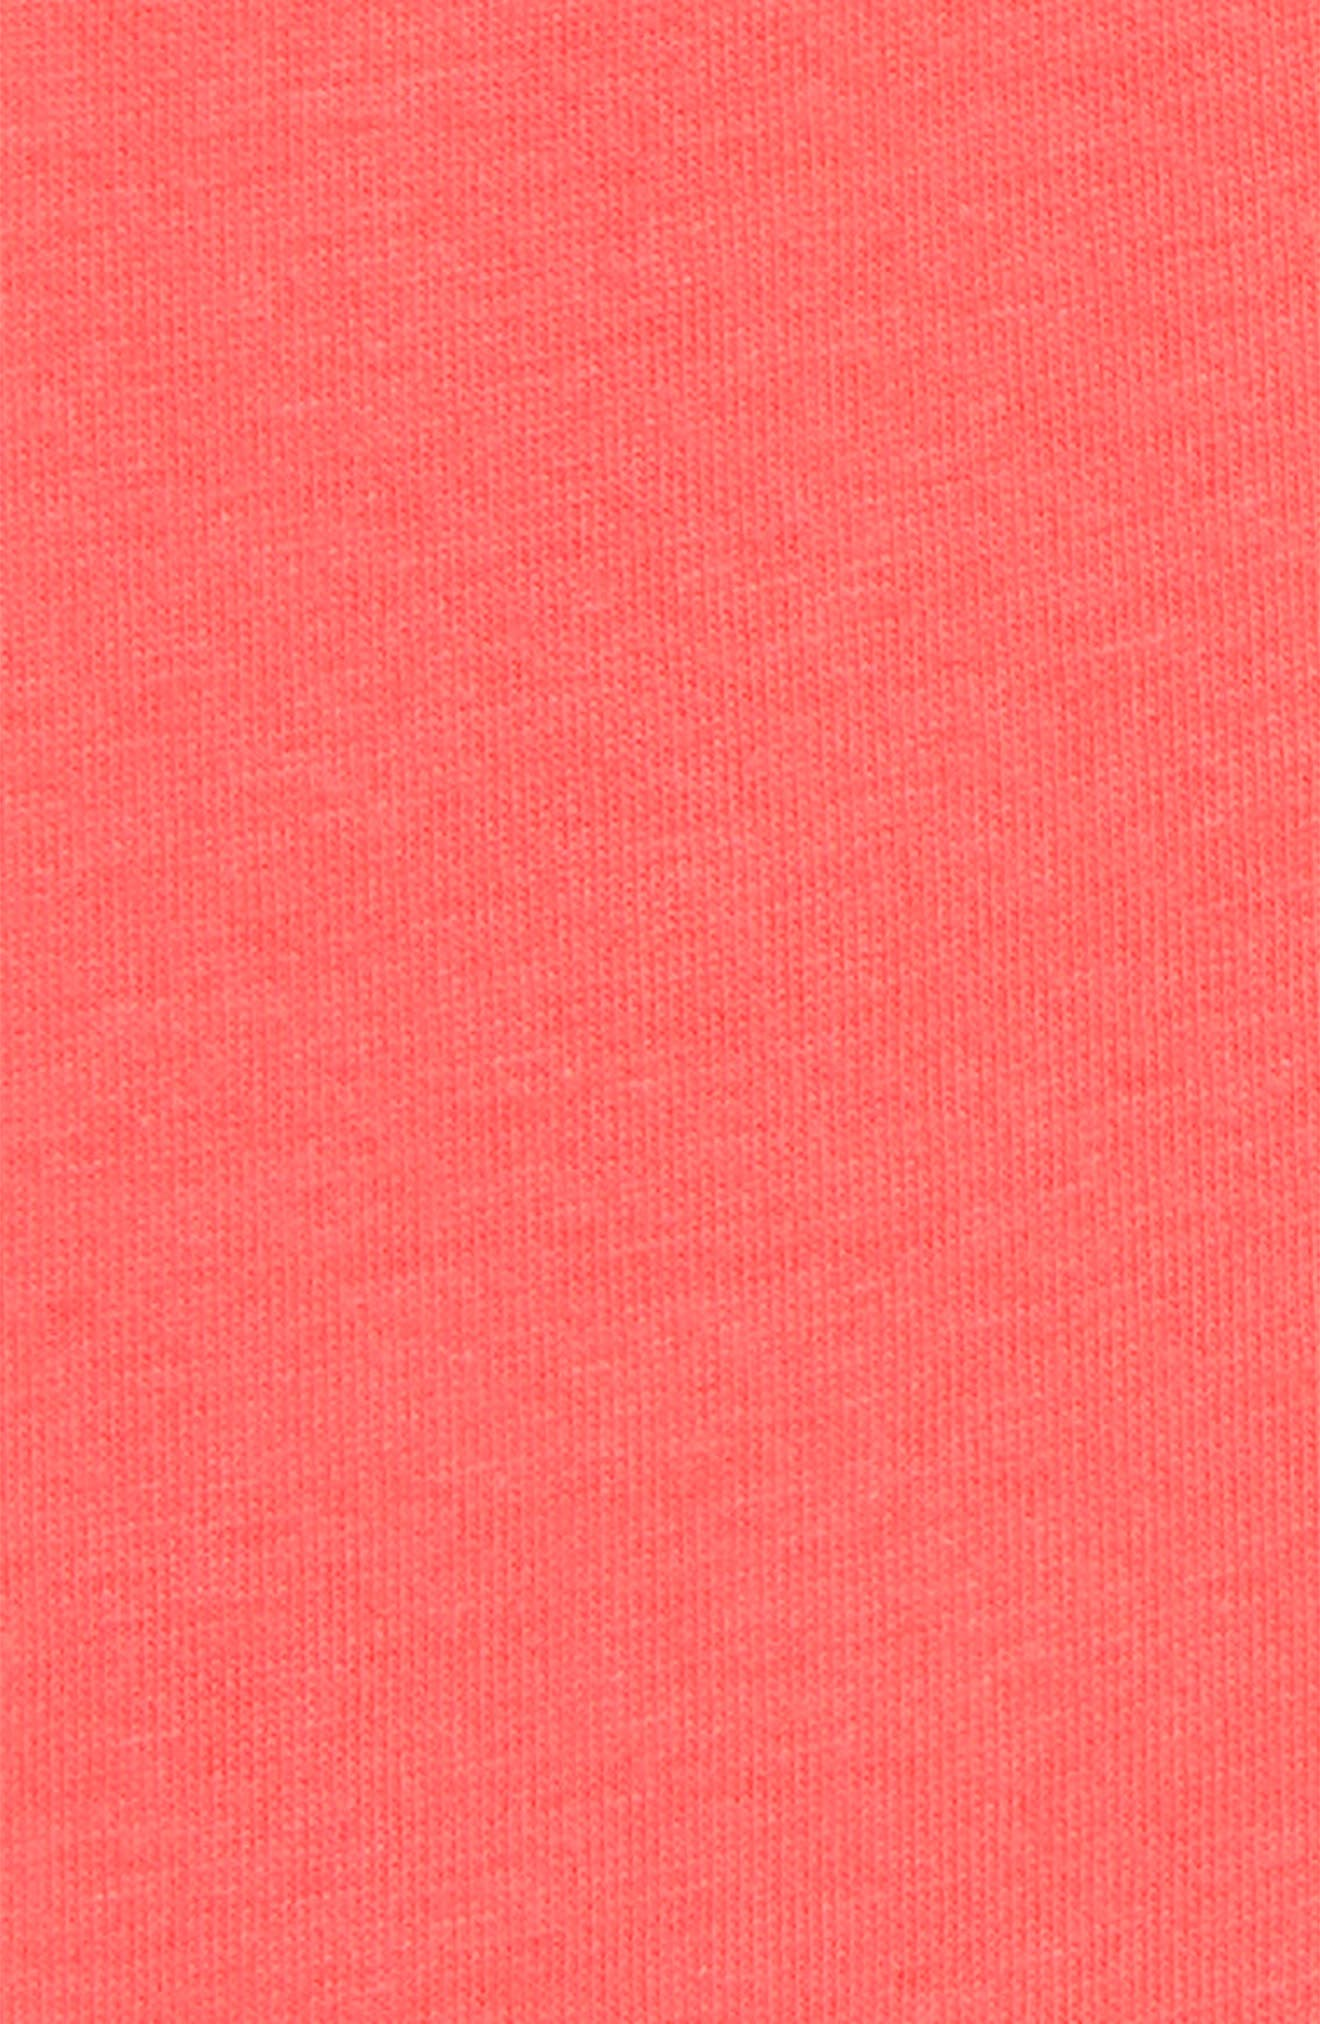 Essential Leggings,                             Alternate thumbnail 2, color,                             958